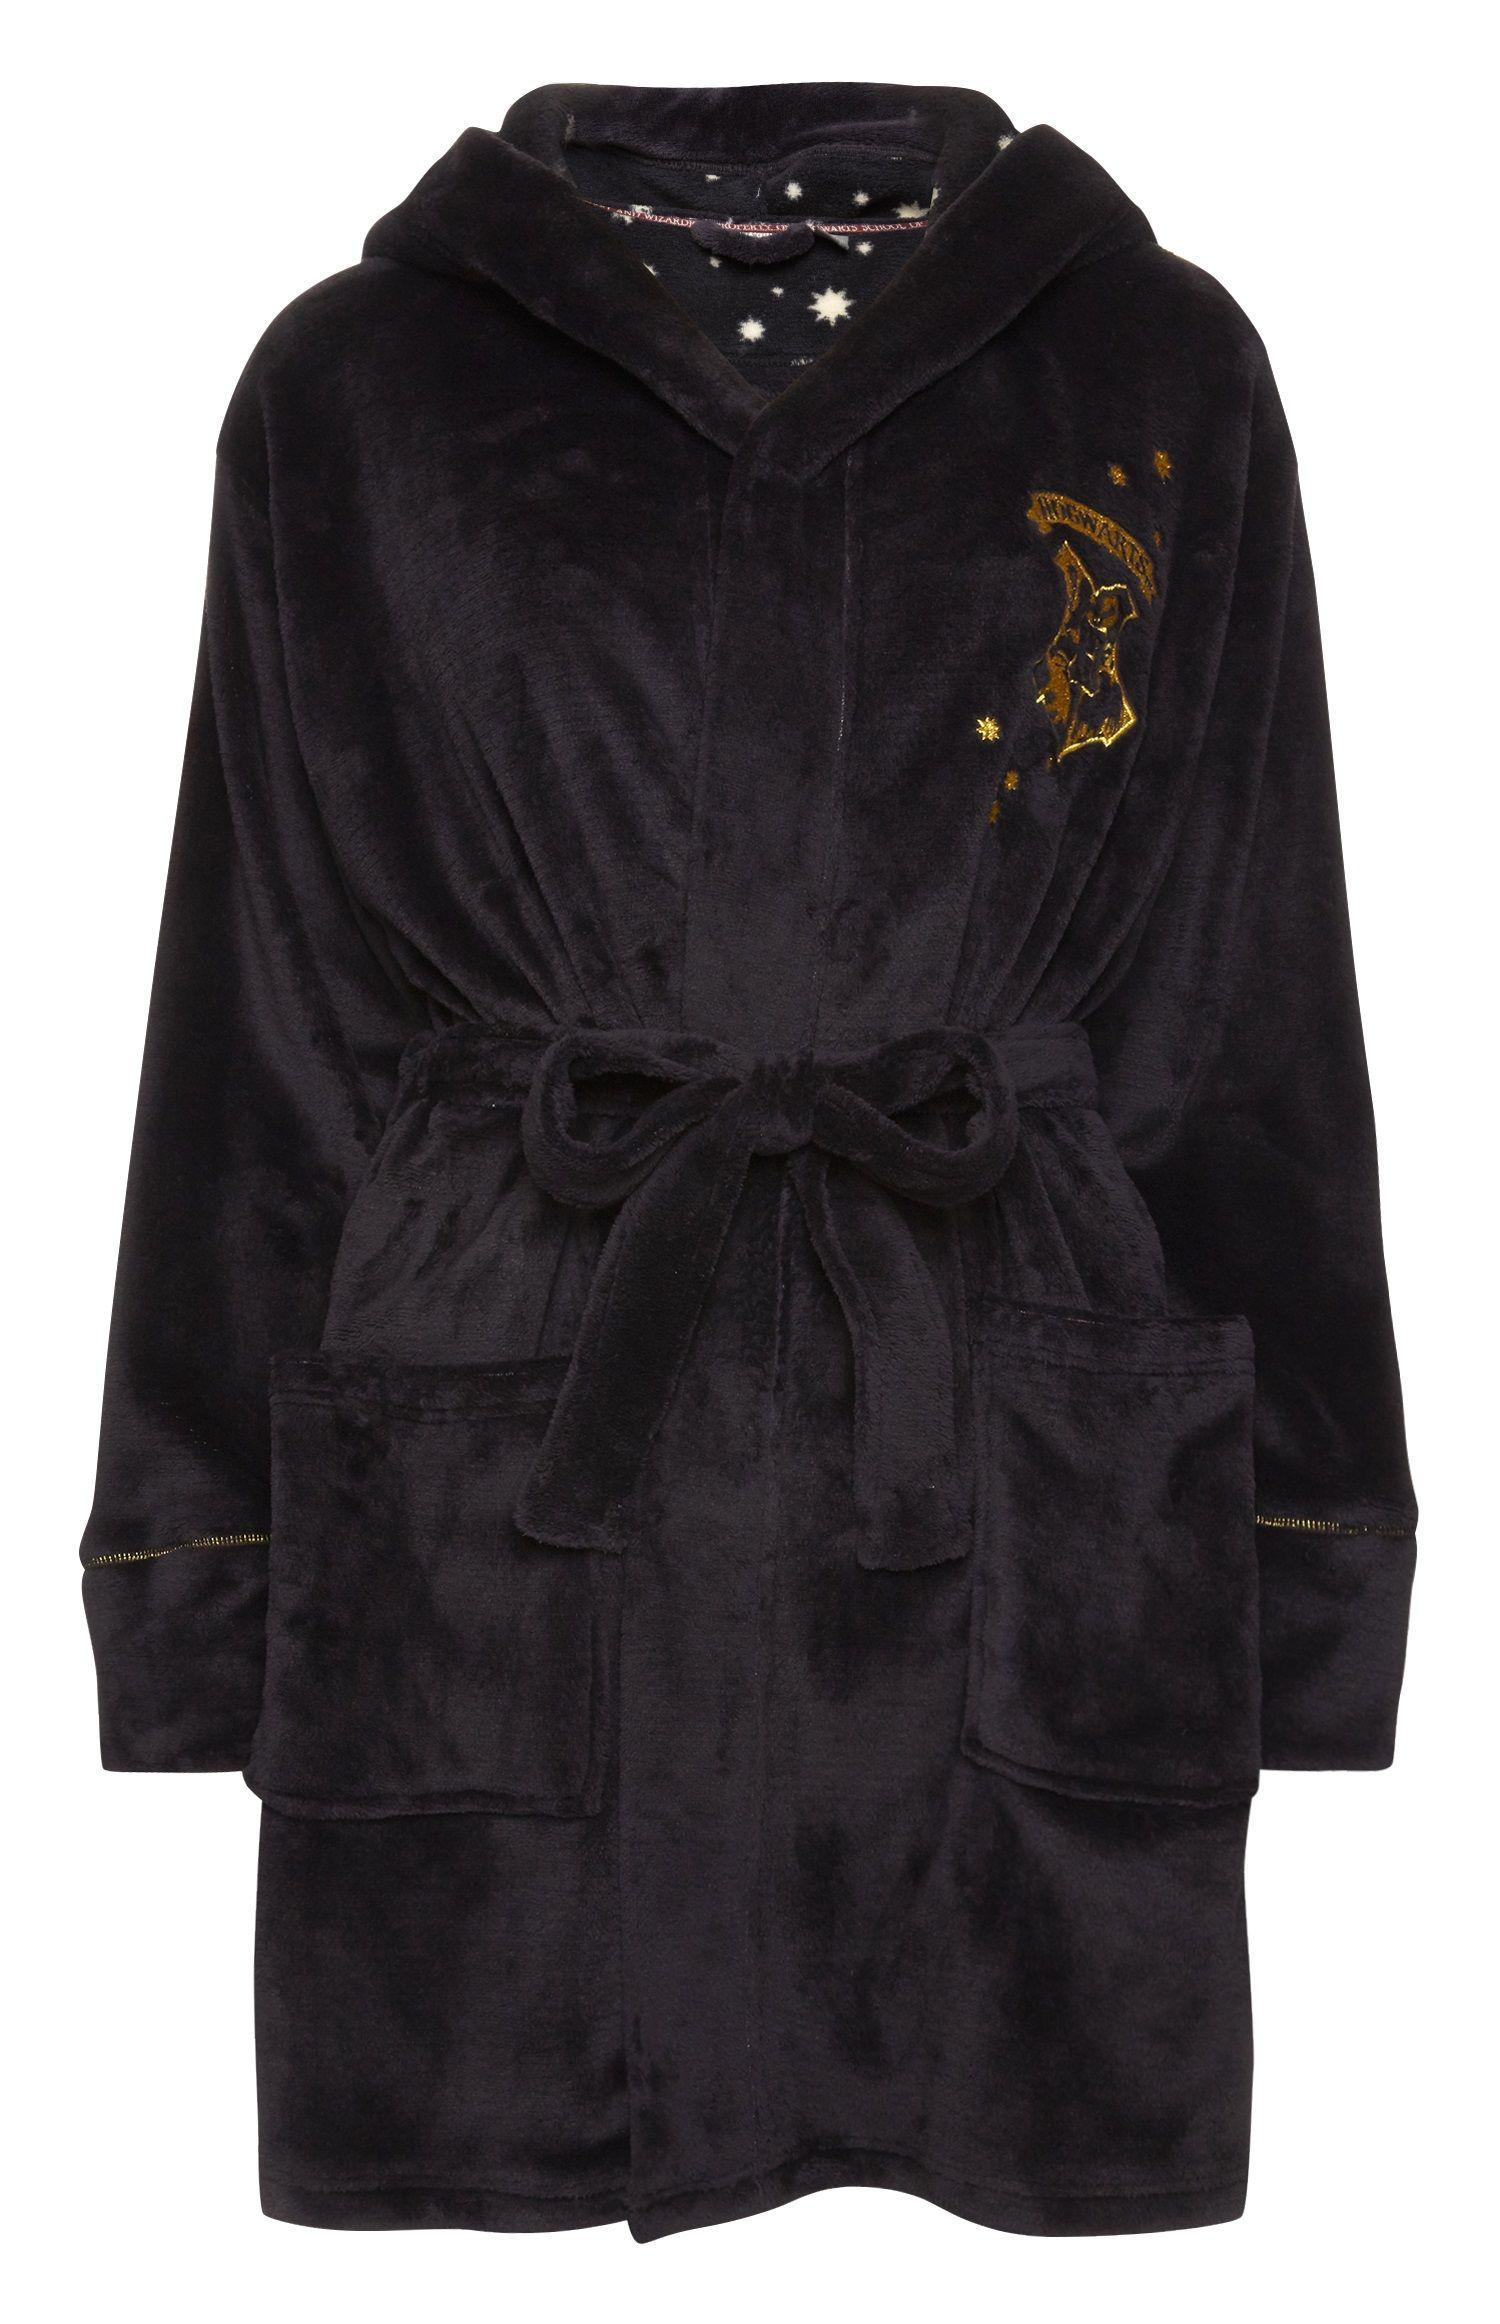 Primark - Harry Potter Dressing Gown Robe   Harry Potter inspired ...